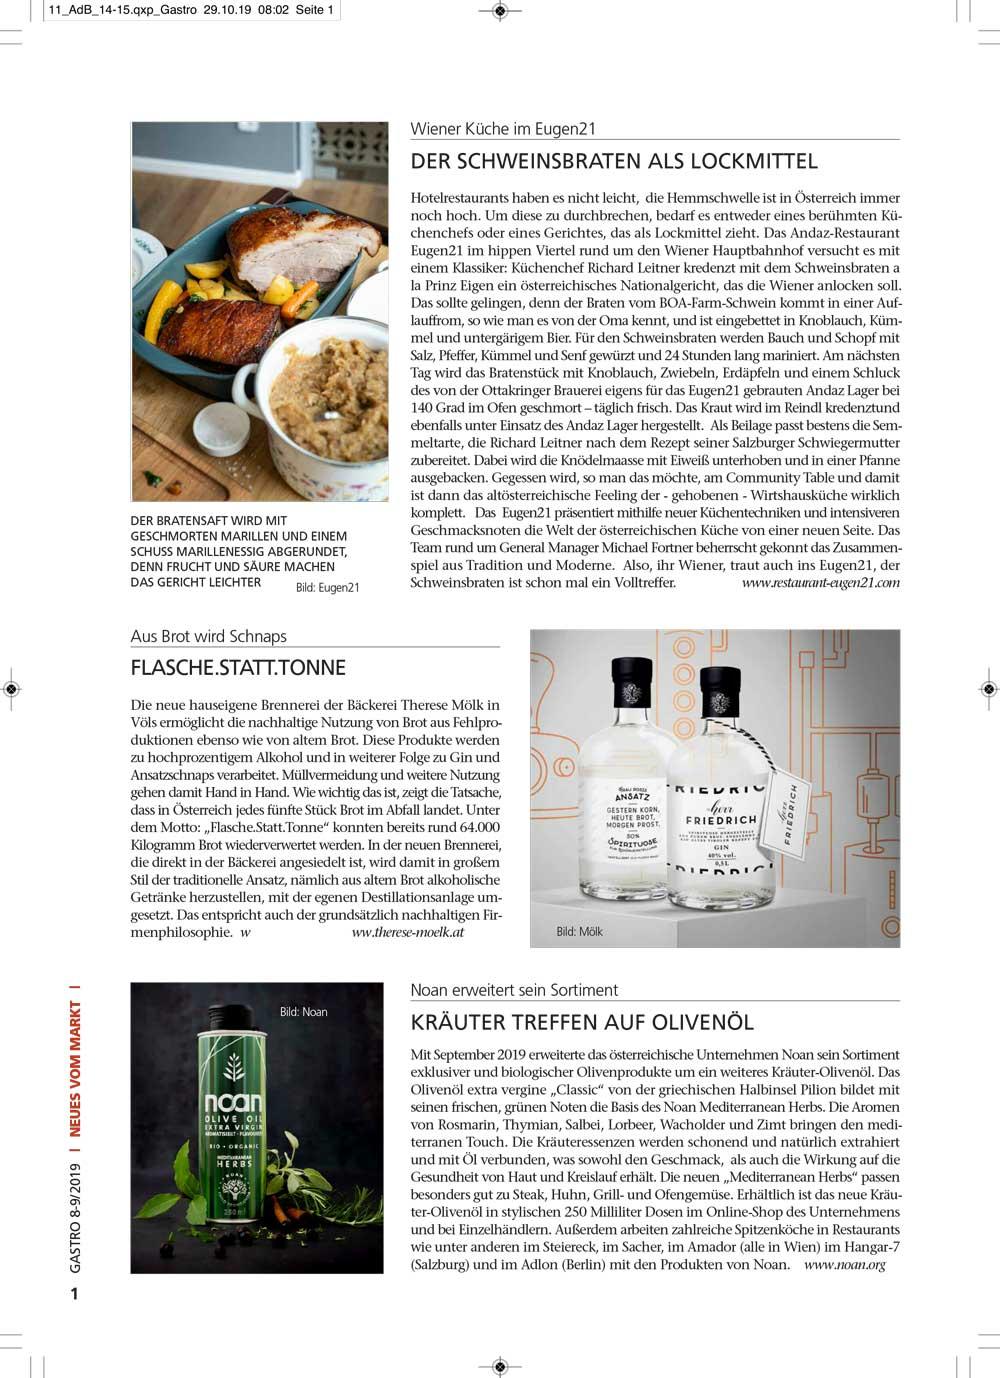 gastro Magazin Print Beitrag Noan Herbs